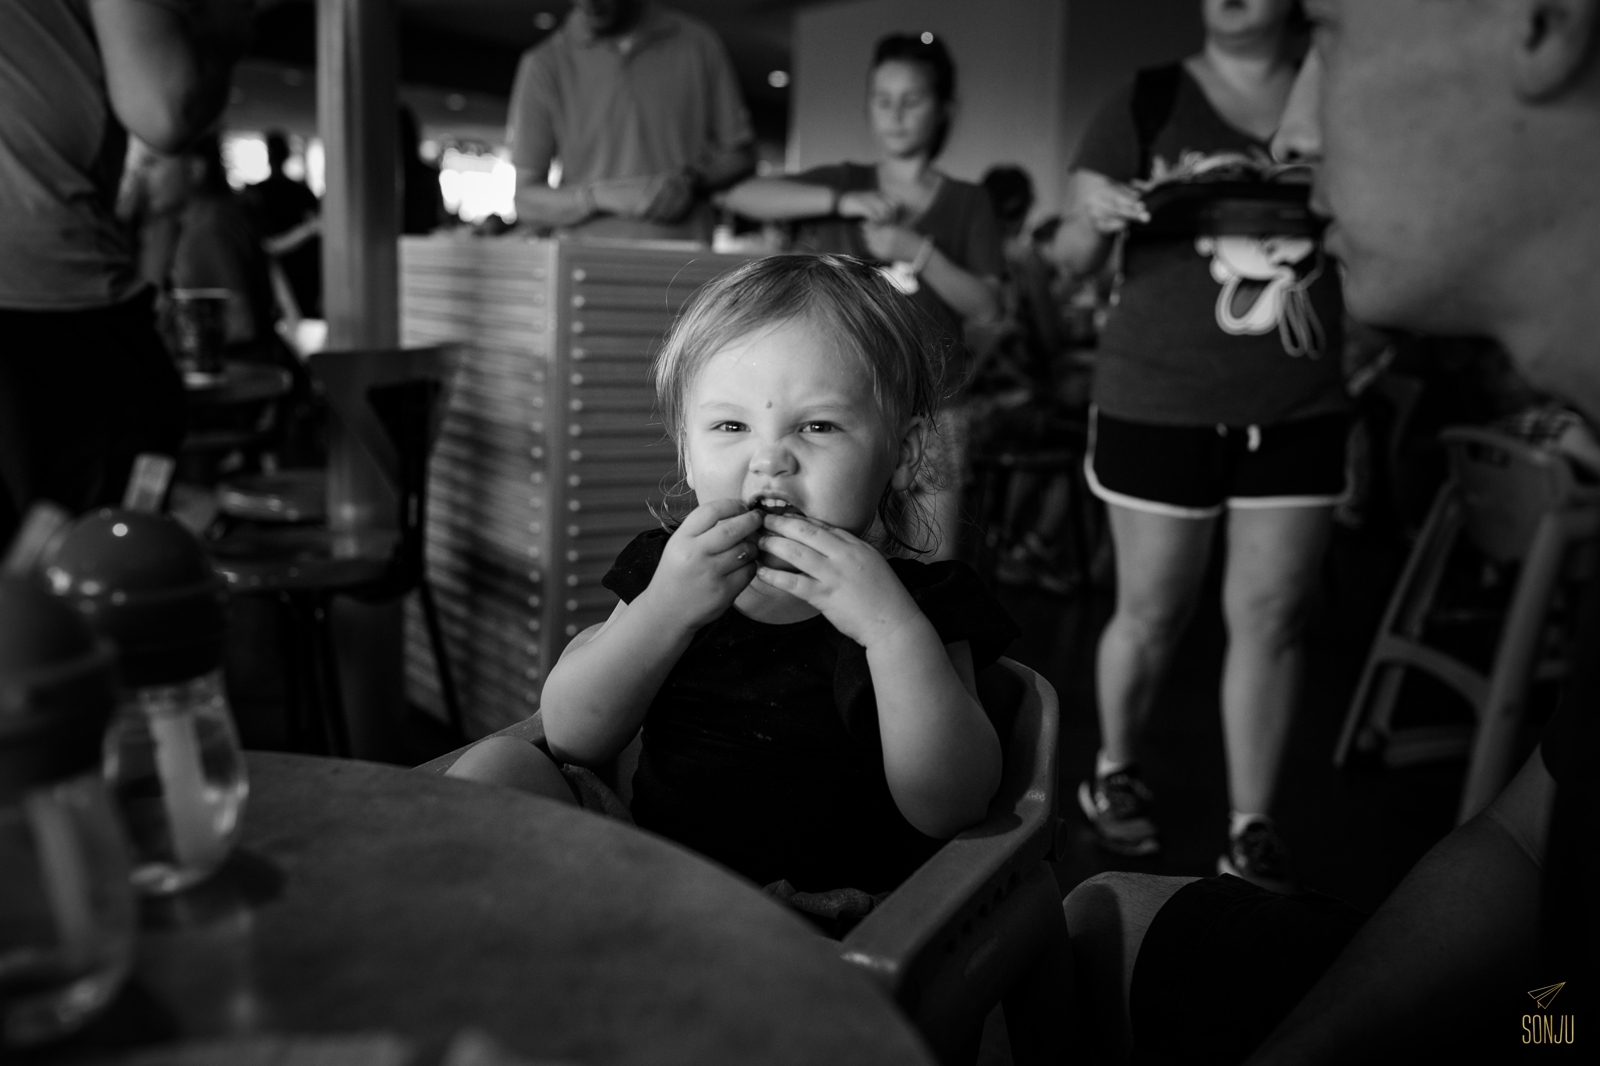 Central-Orlando-Theme-Park-Family-Photography00014.jpg